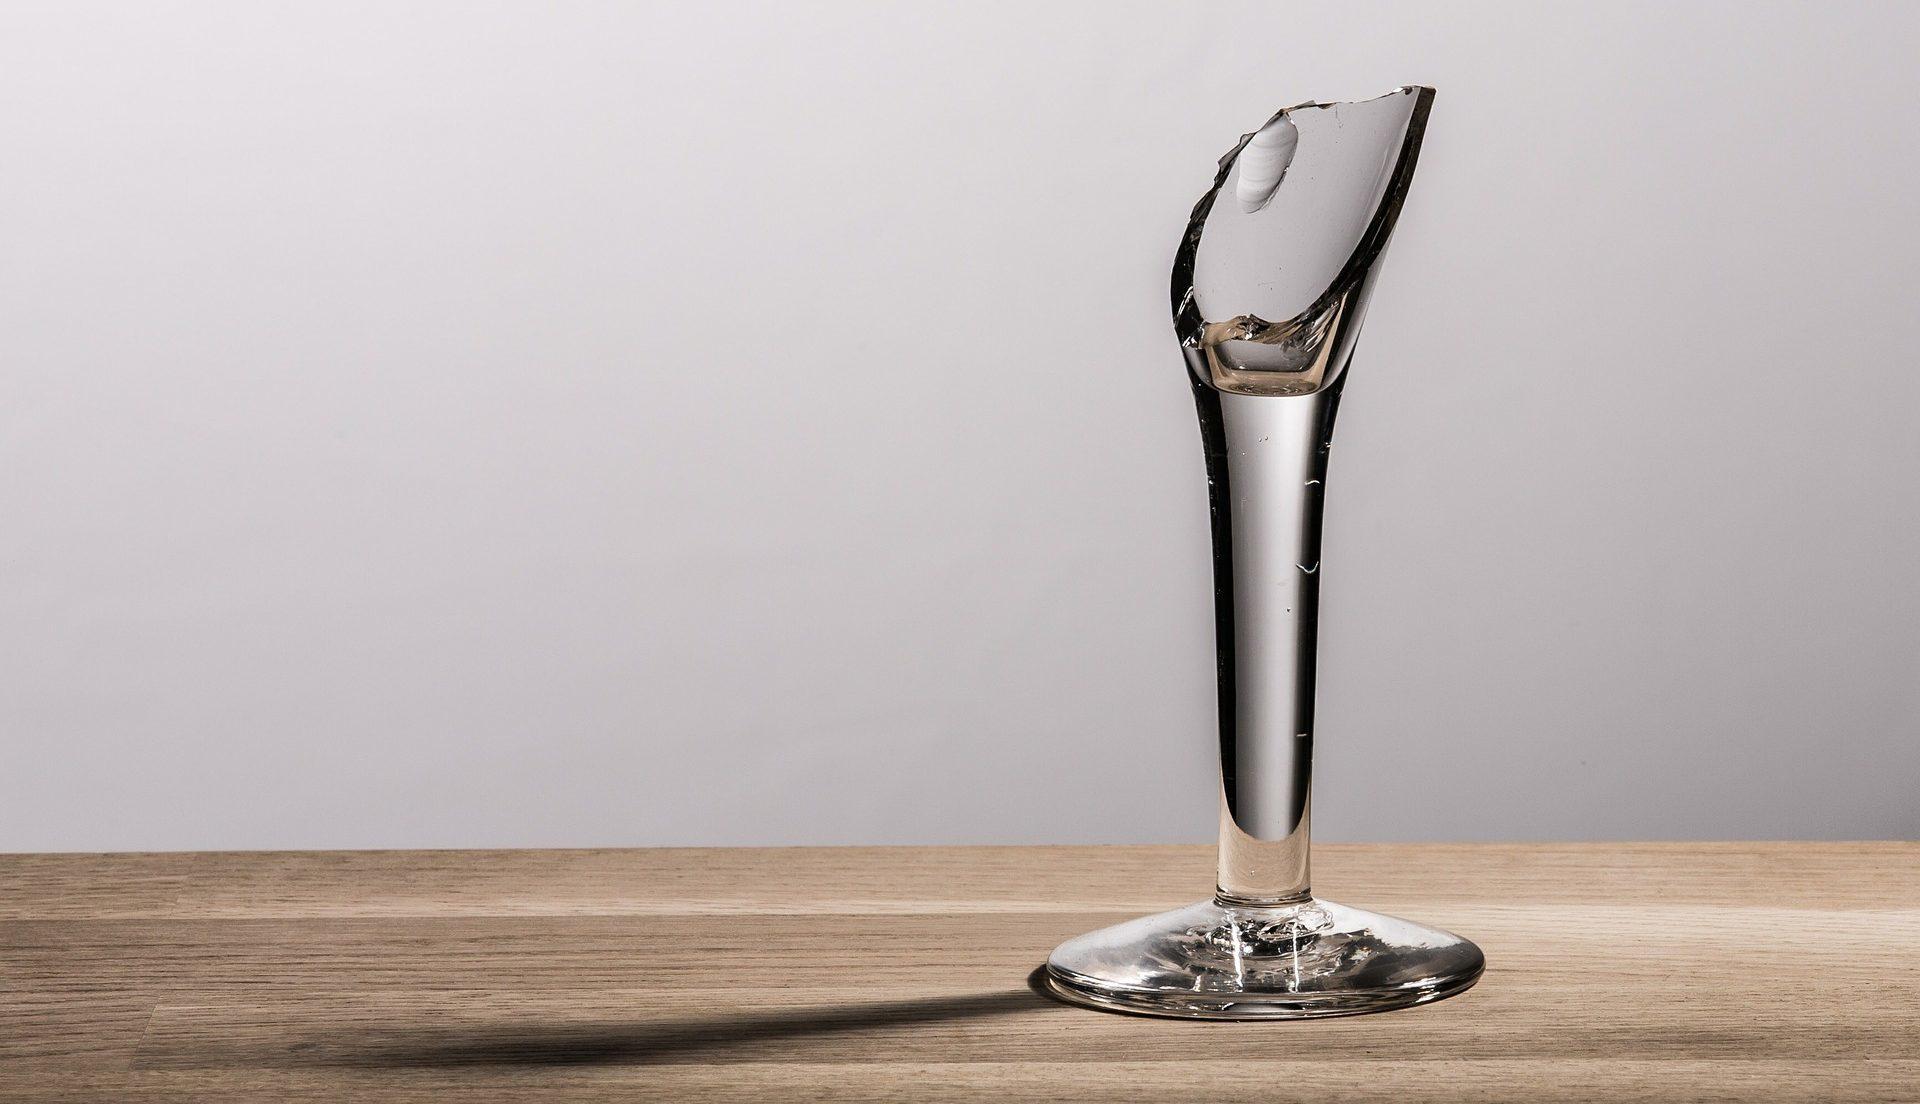 vaso roto recurso